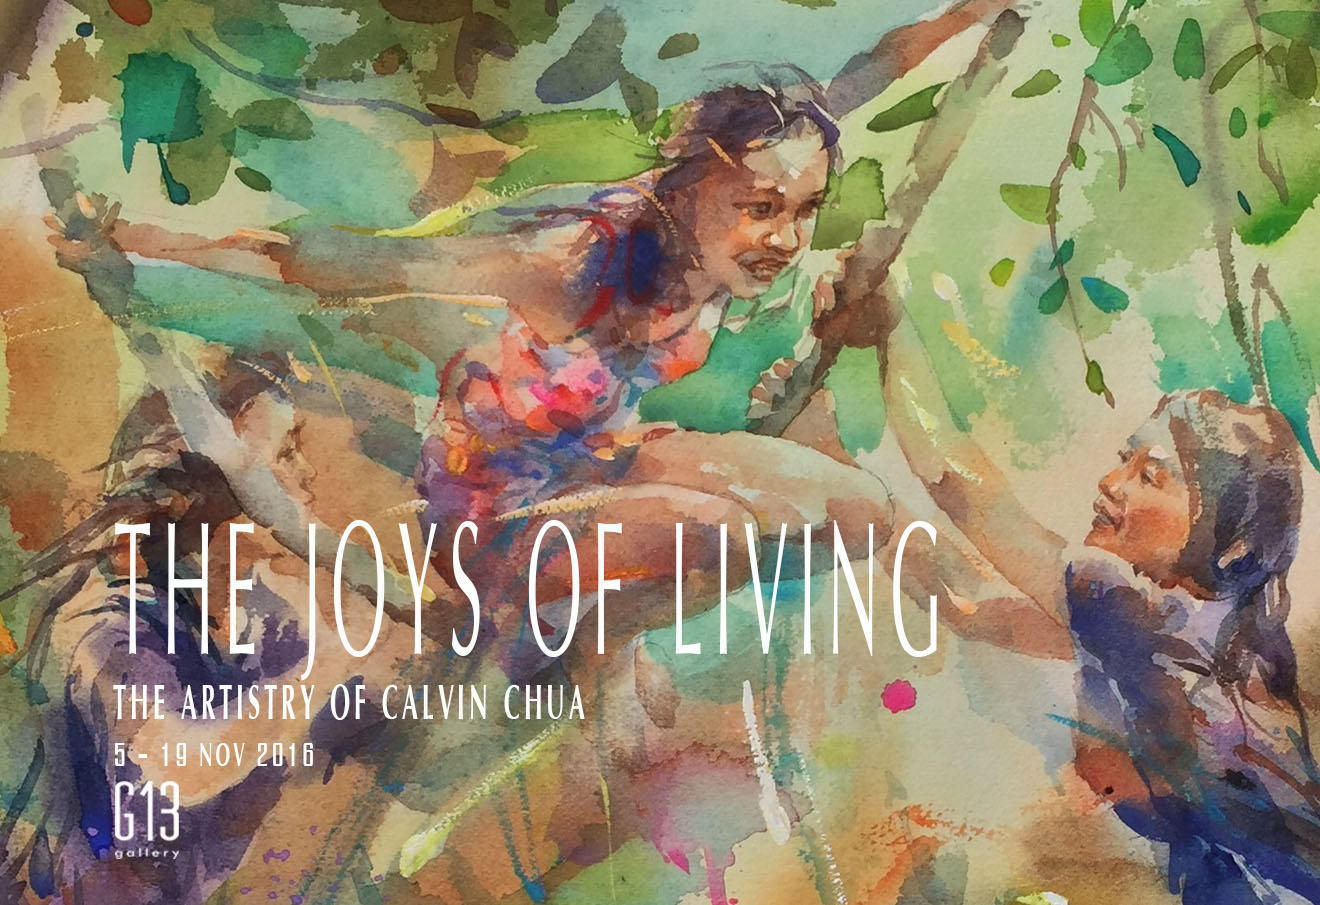 THE JOYS OF LIVING: THE ARTISTRY OF CALVIN CHUA